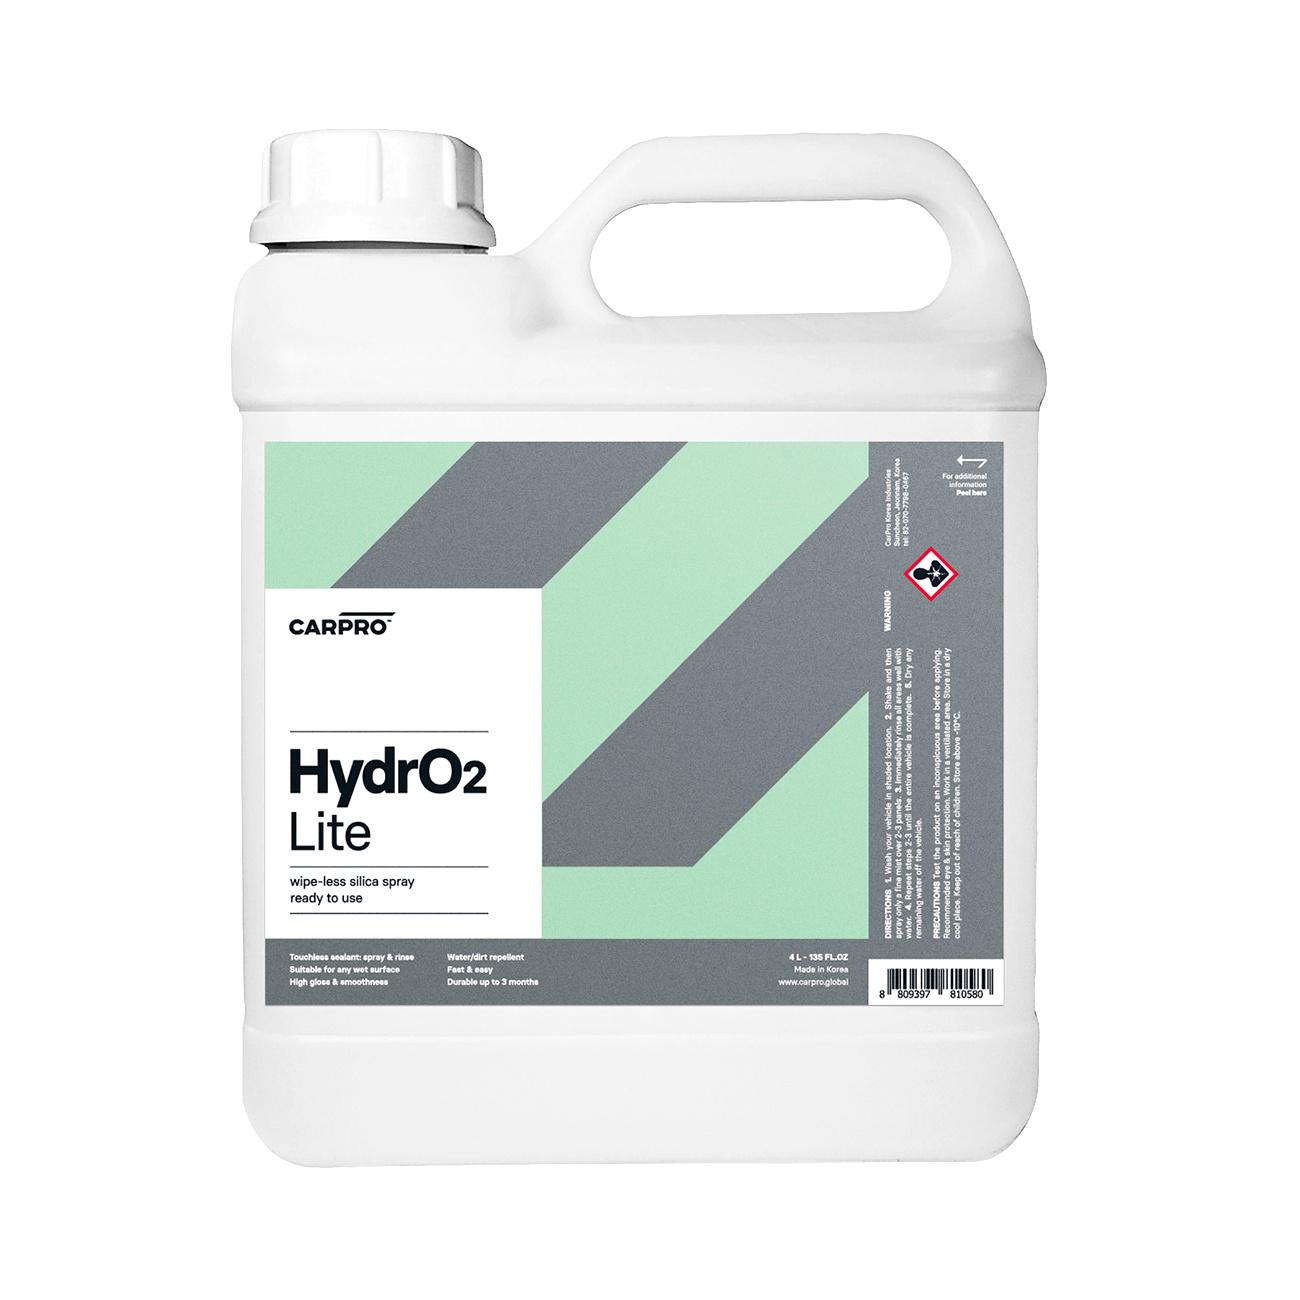 CarPro CarPro Hydro2 LITE READY